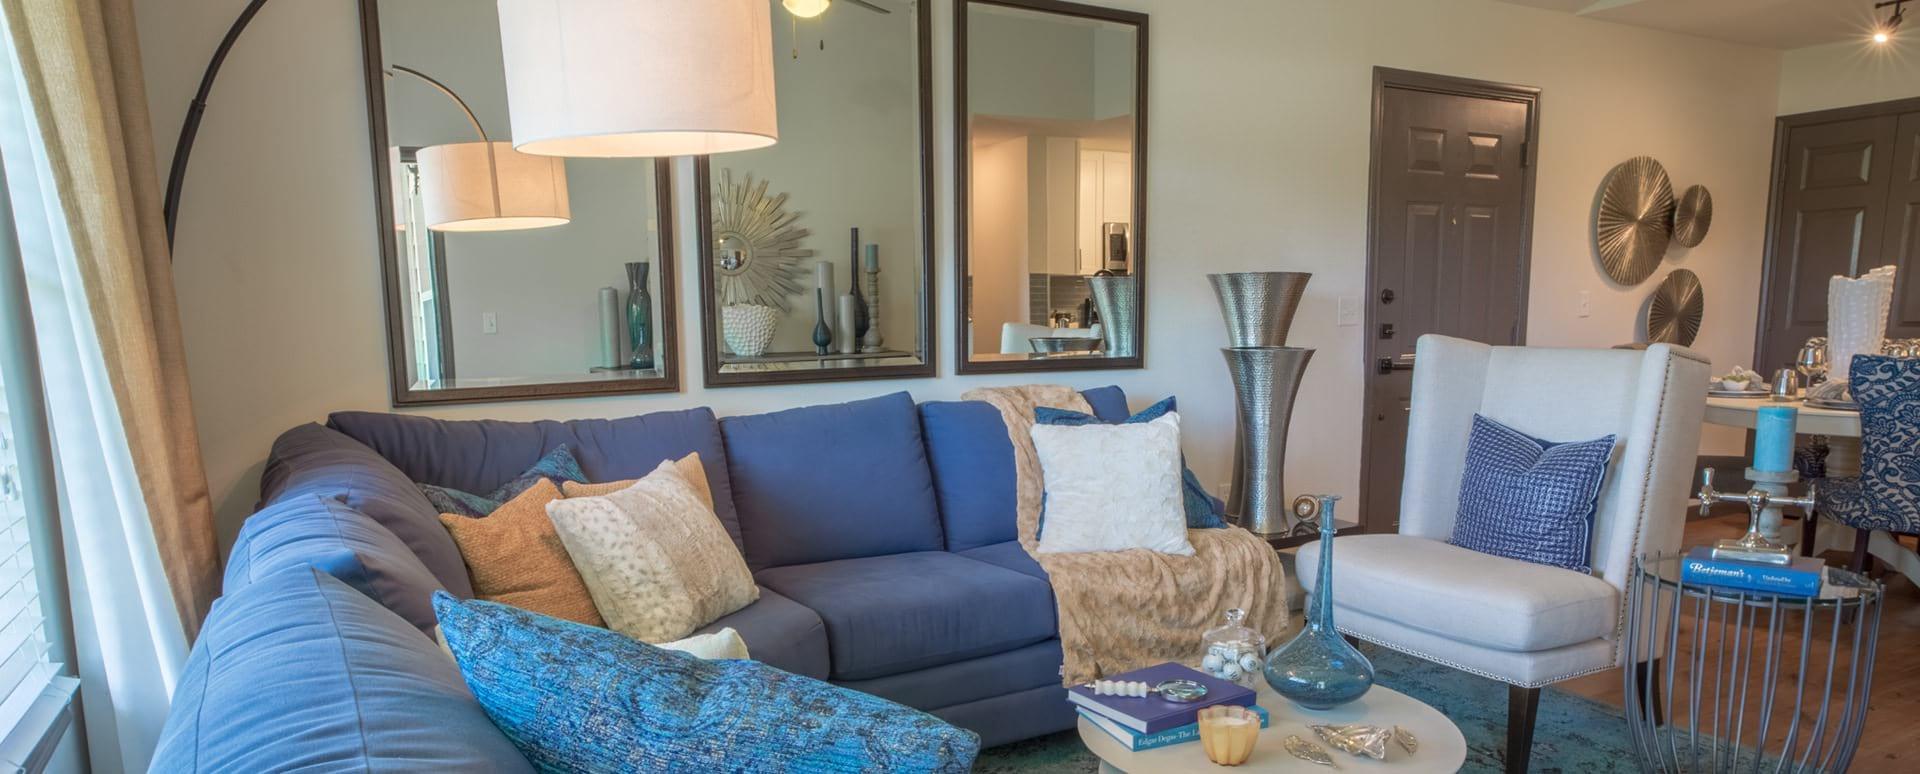 Spacious apartment floor plan at Attiva Denton